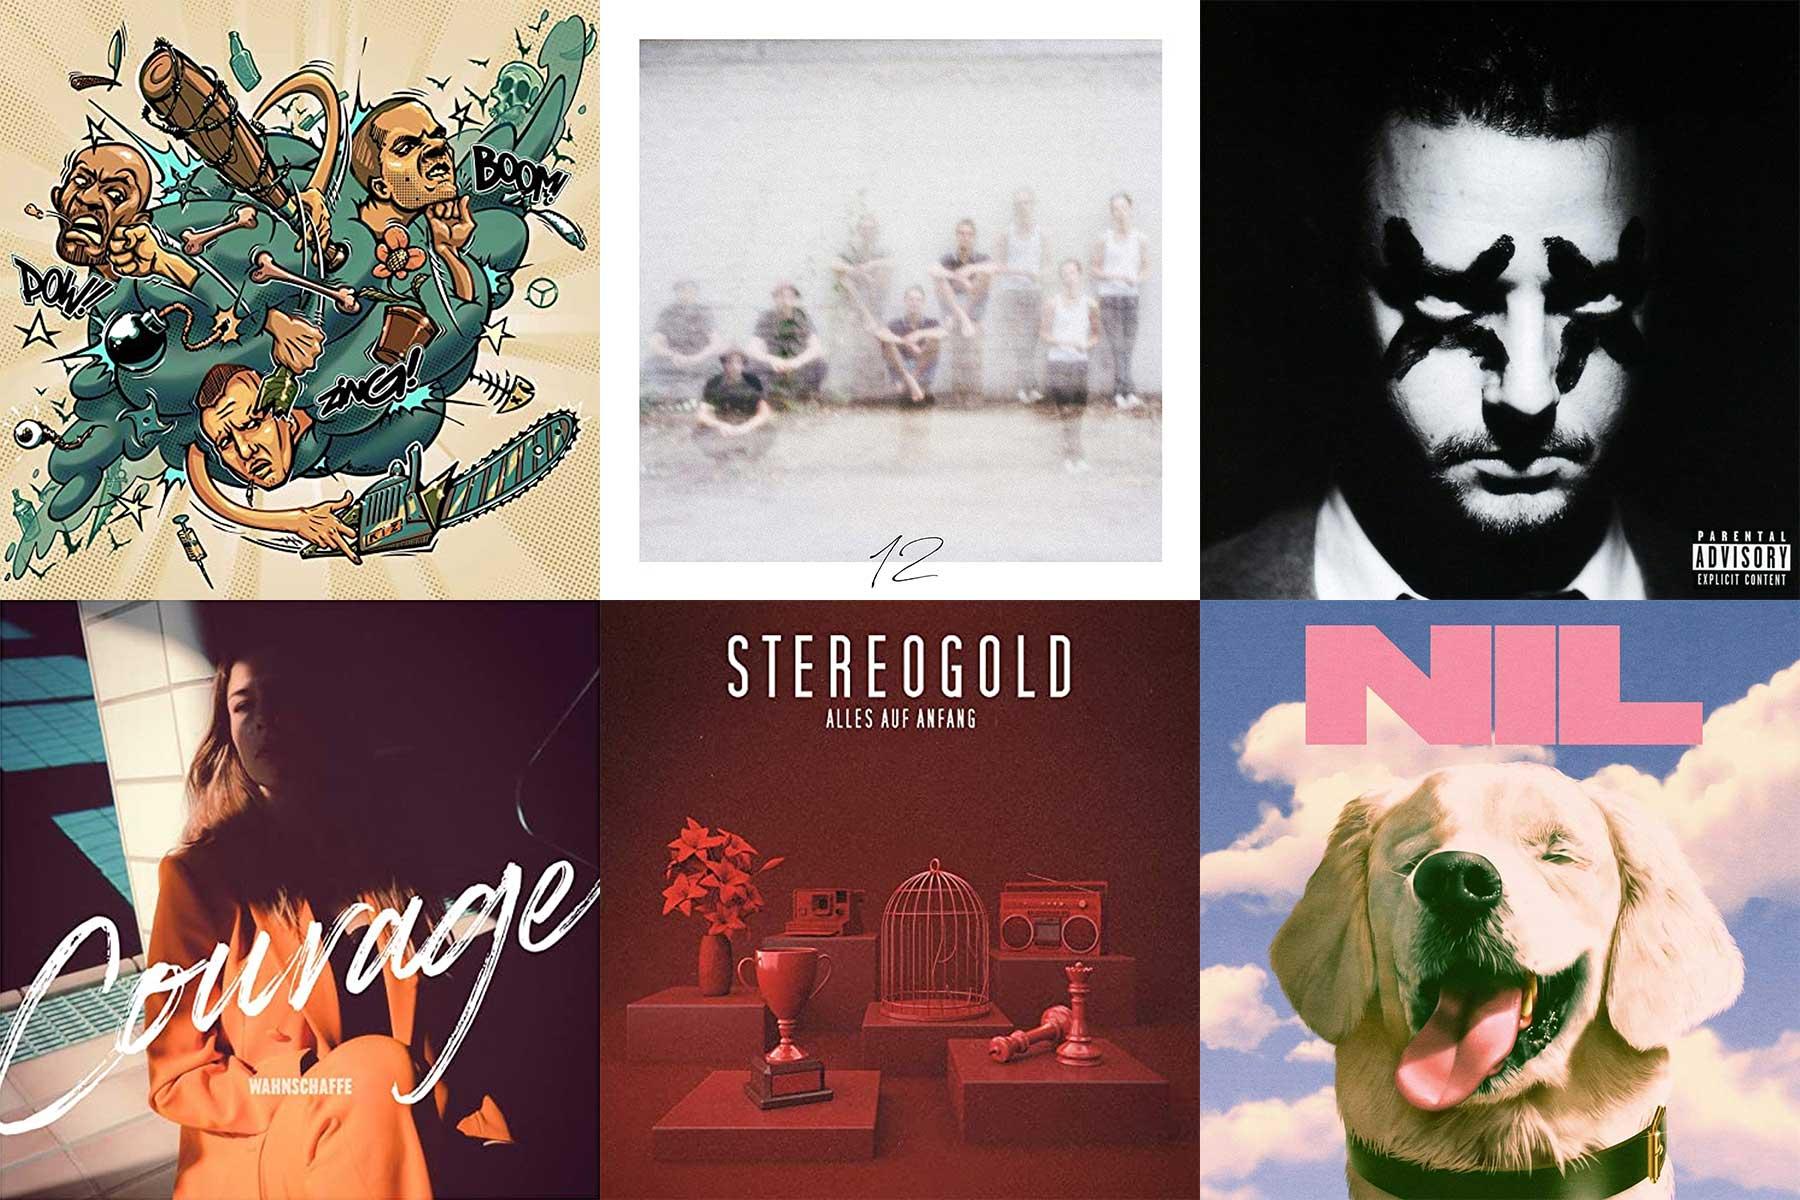 Kurzreviews: Neue Musikalben im Dezember 2020 Albumkuzreviews_2020-12